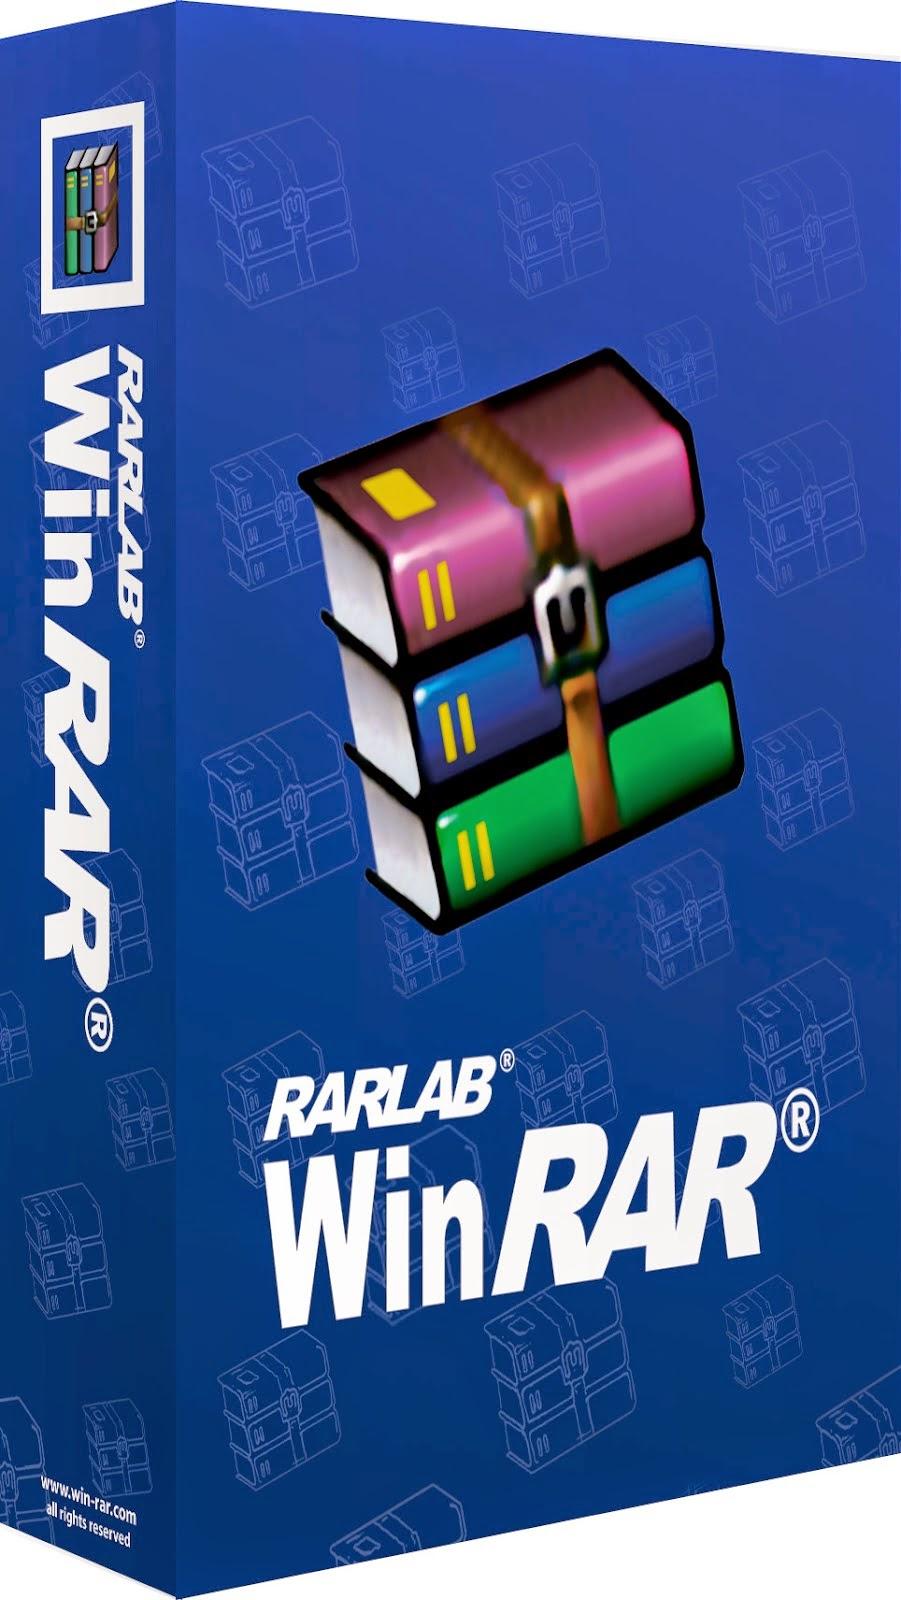 winzip free download for windows 10 64 bit full version